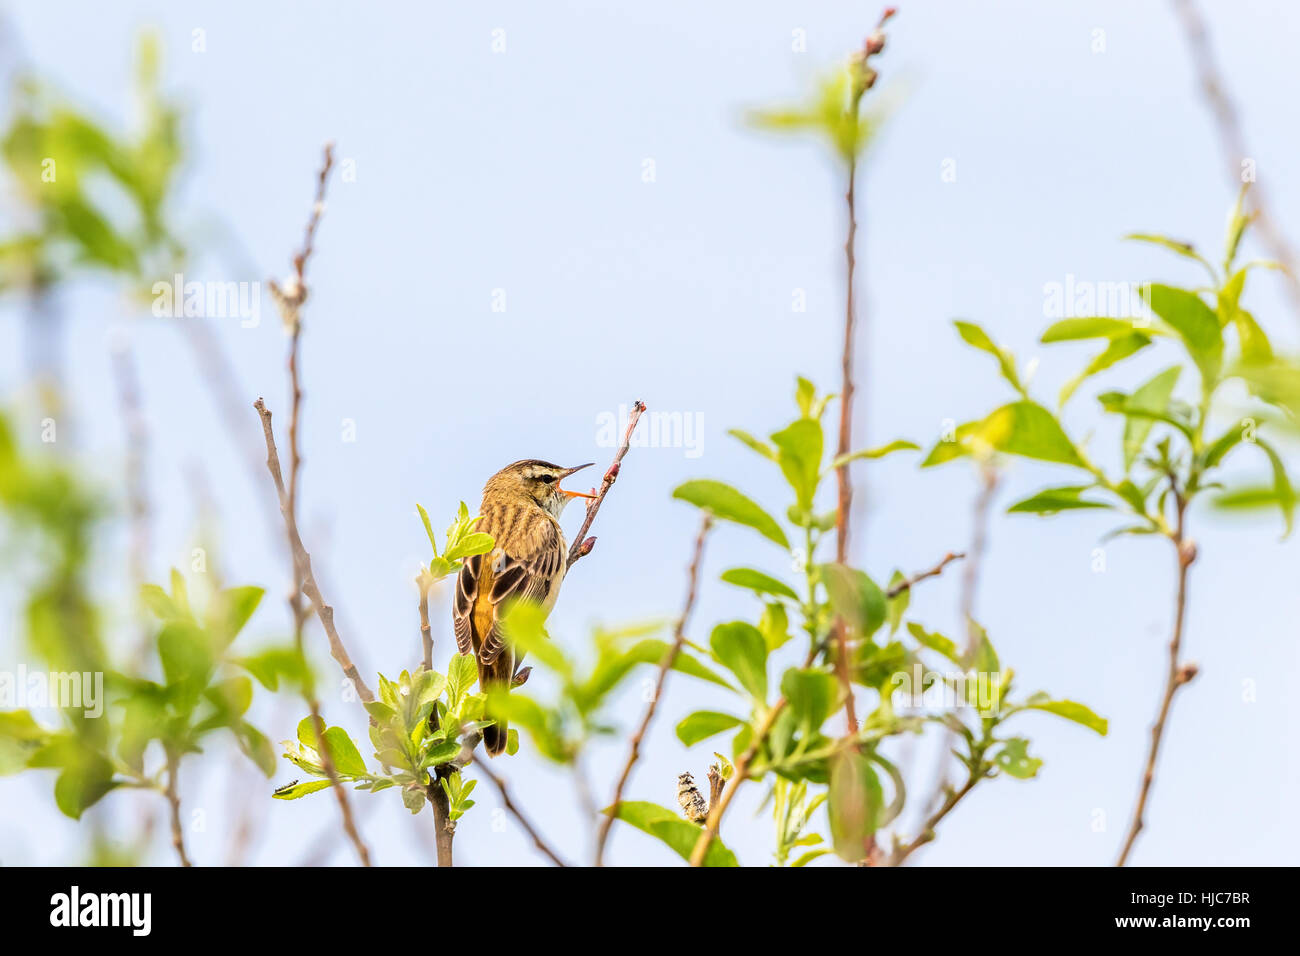 Singing Sedge warbler in a tree top - Stock Image